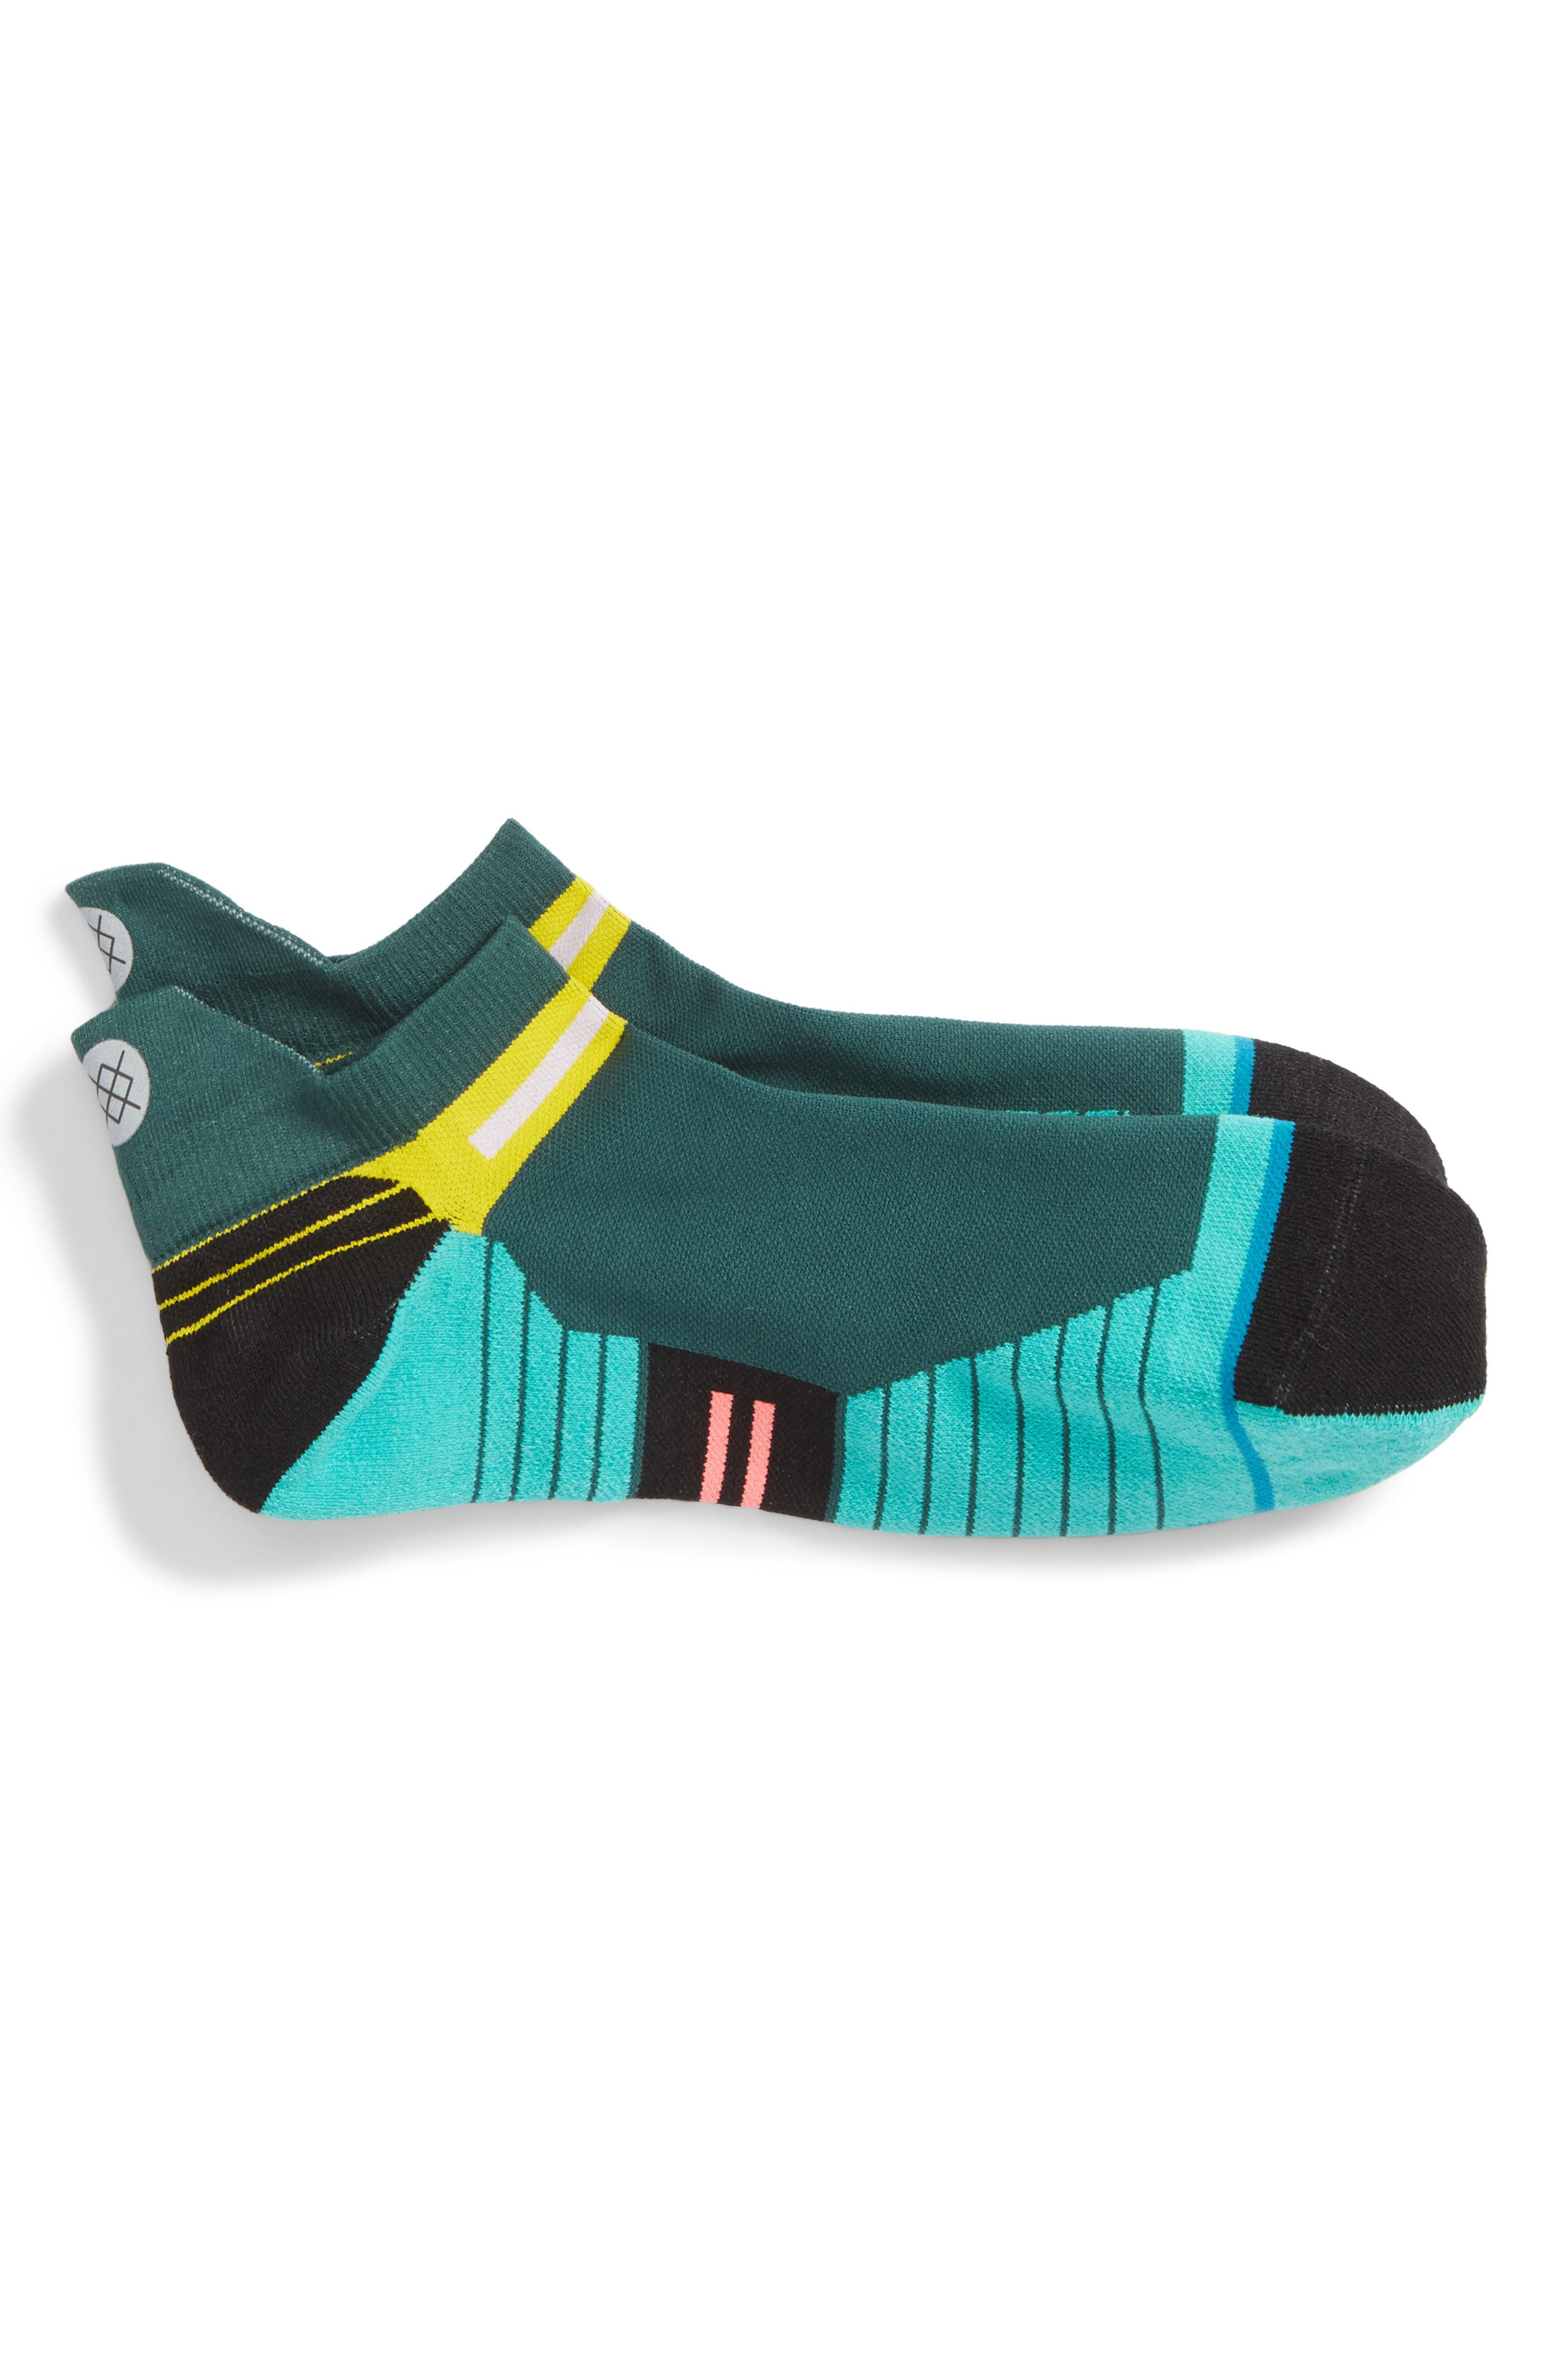 Manoa Tab Ankle Socks,                         Main,                         color, 340